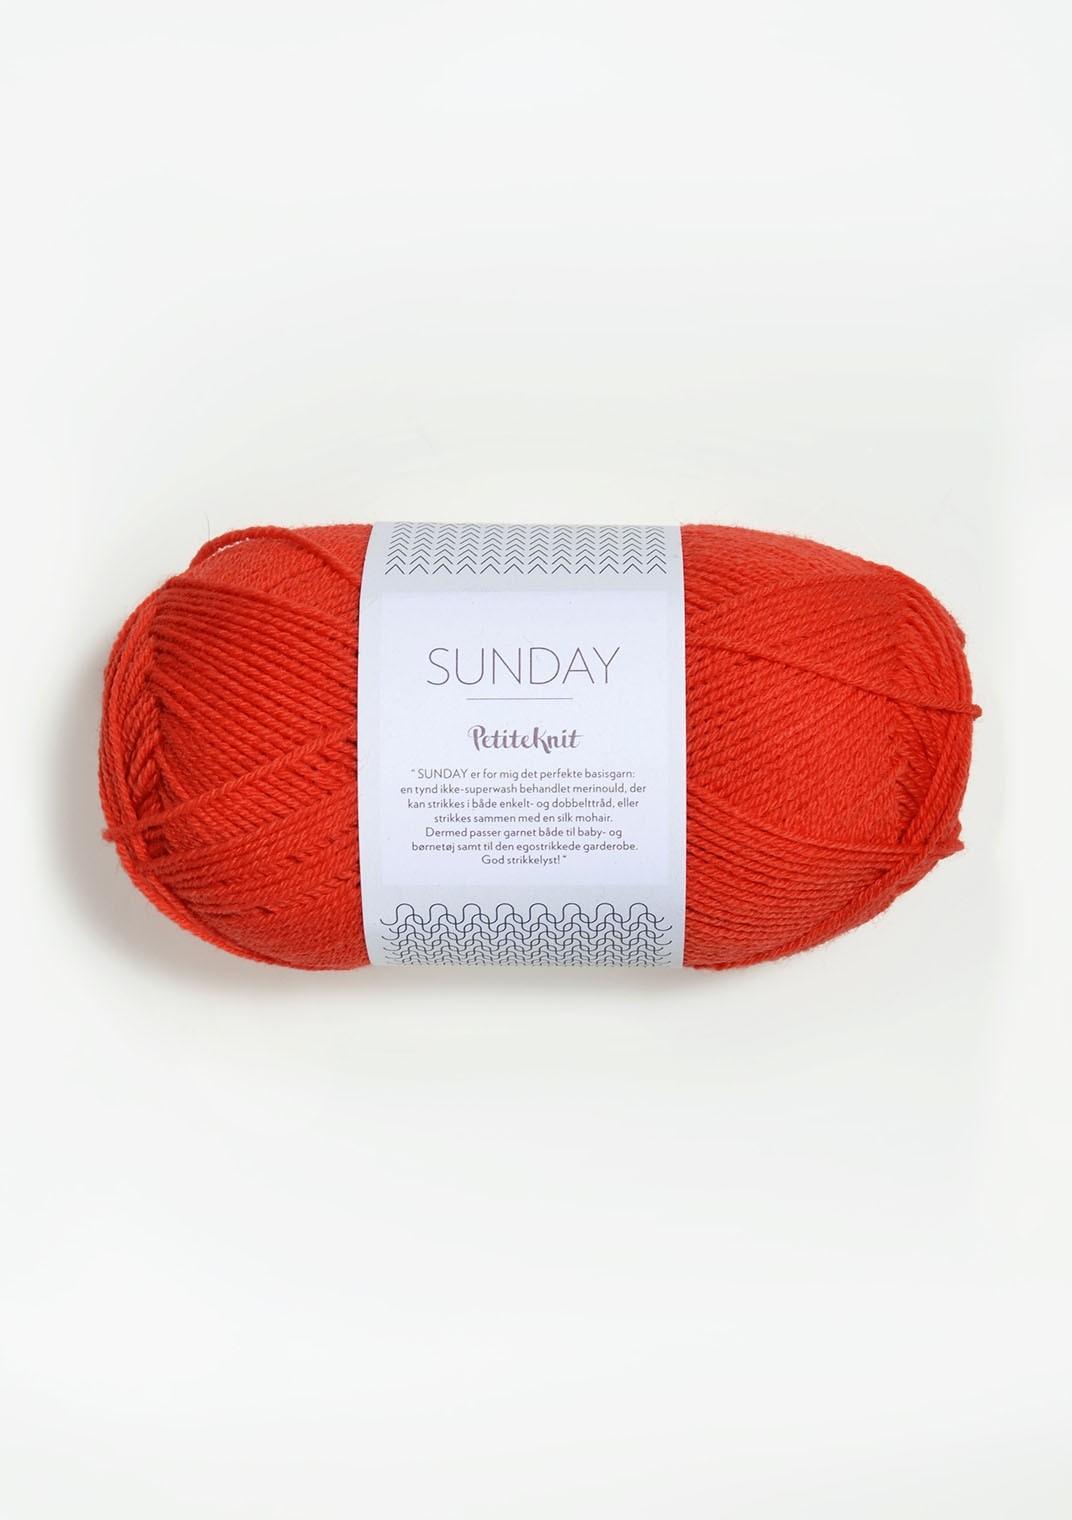 SANDNES 3819 That Orange Feeling Sunday PetiteKnit